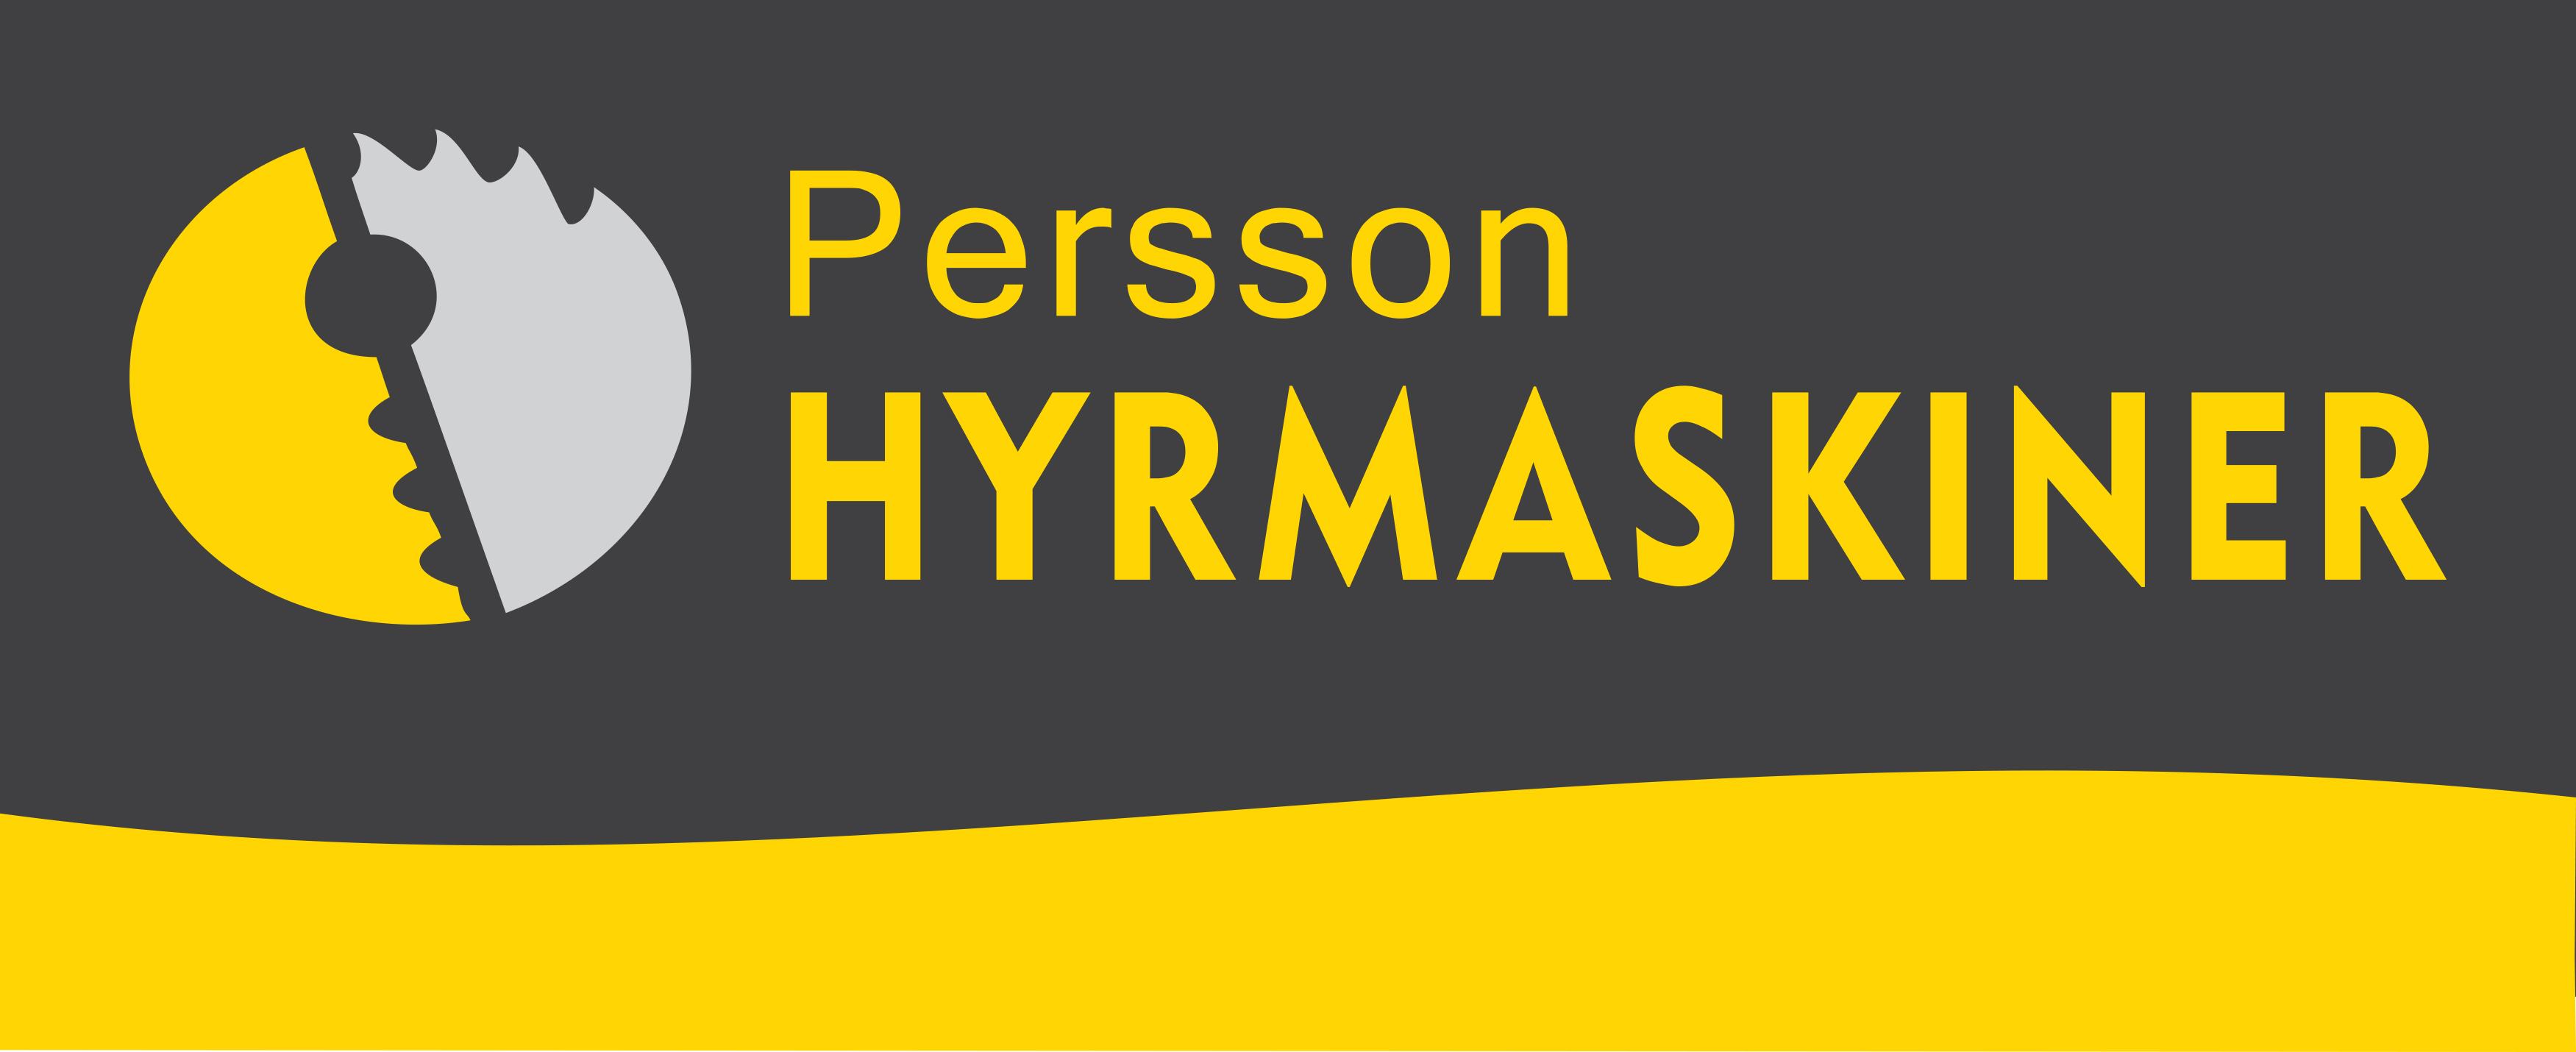 Persson Hyrmaskiner logo 2018